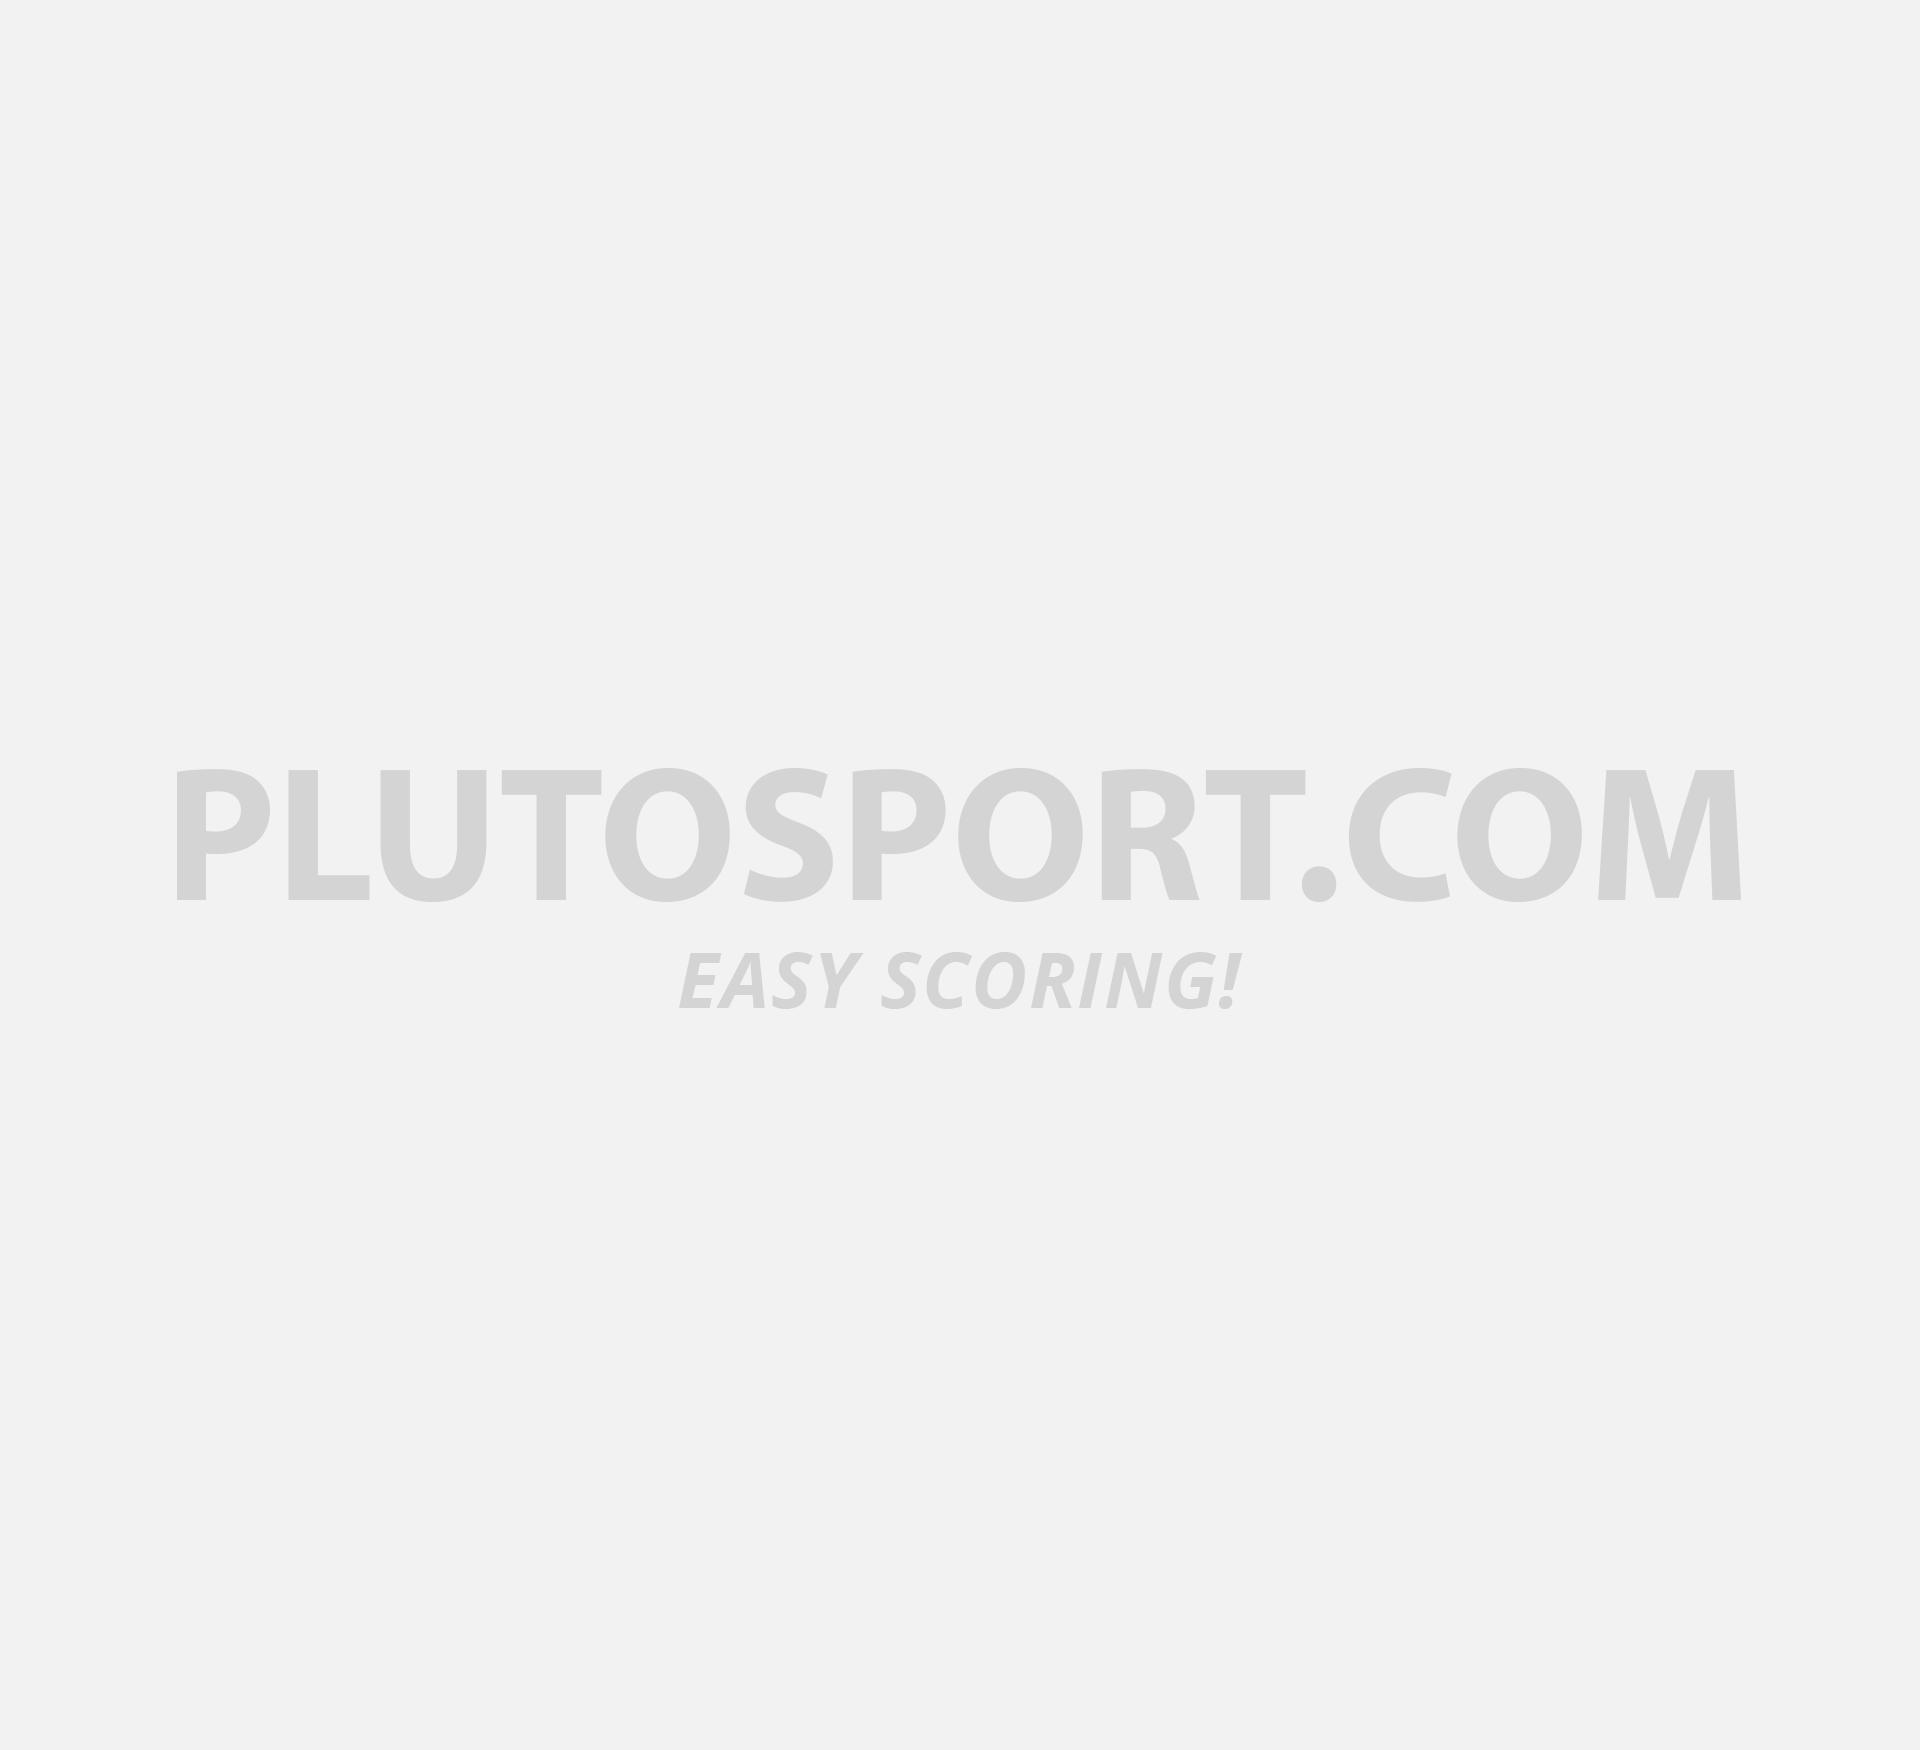 b70e8f71f6e4 Puma Boys Evostripe Pants Jr - Sweat - Pants - Clothing - Lifestyle -  Sports